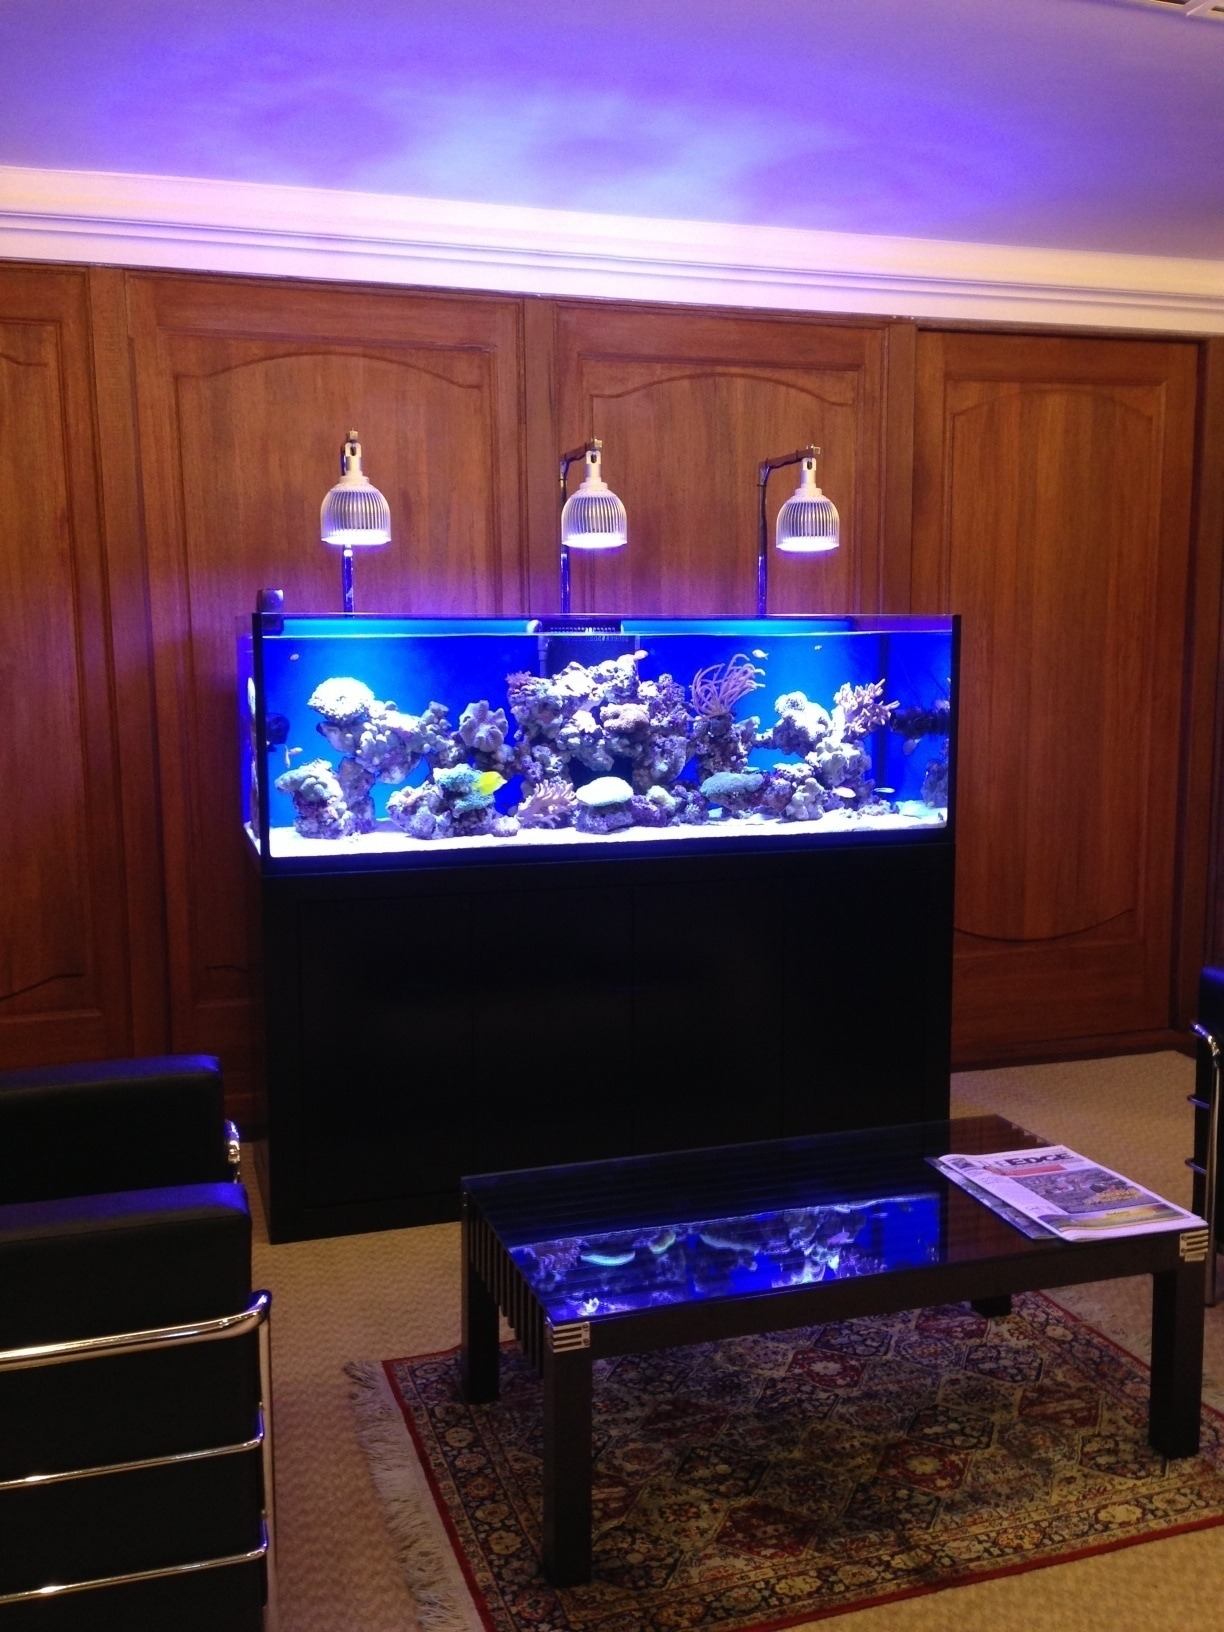 Led Vs Metal Halide Orphek Aquarium Led Lighting